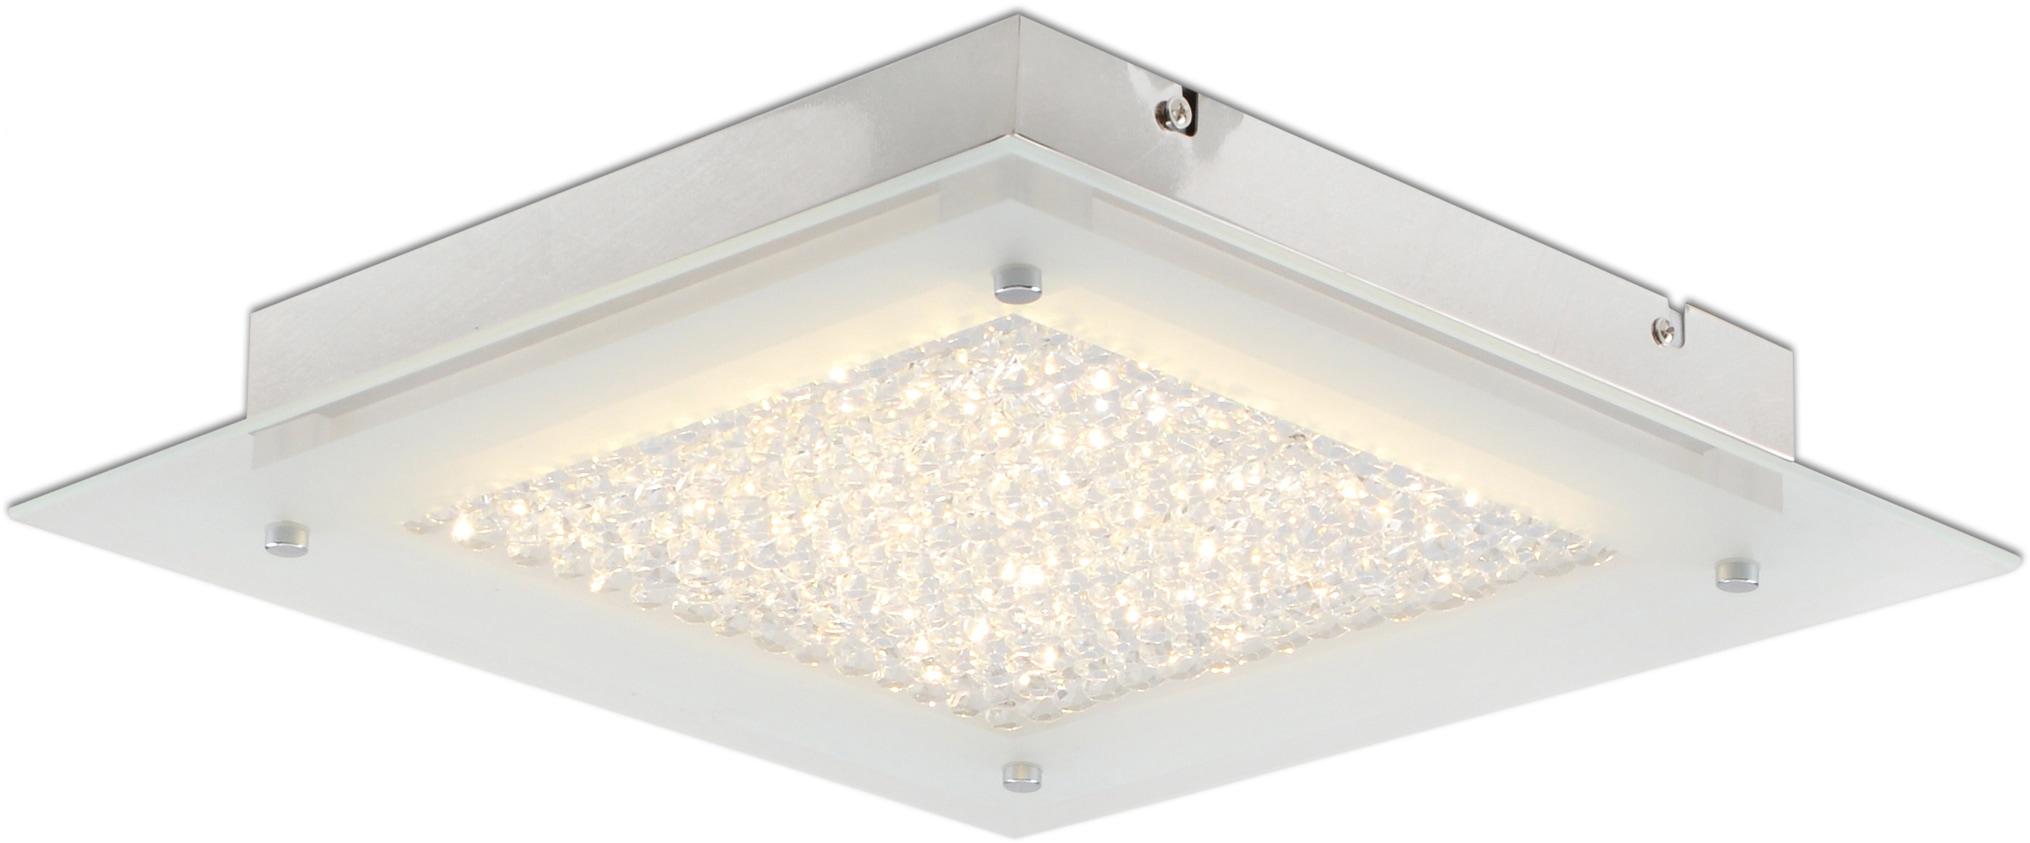 näve LED Deckenleuchte Kristall, LED-Board, Warmweiß, LED Deckenlampe